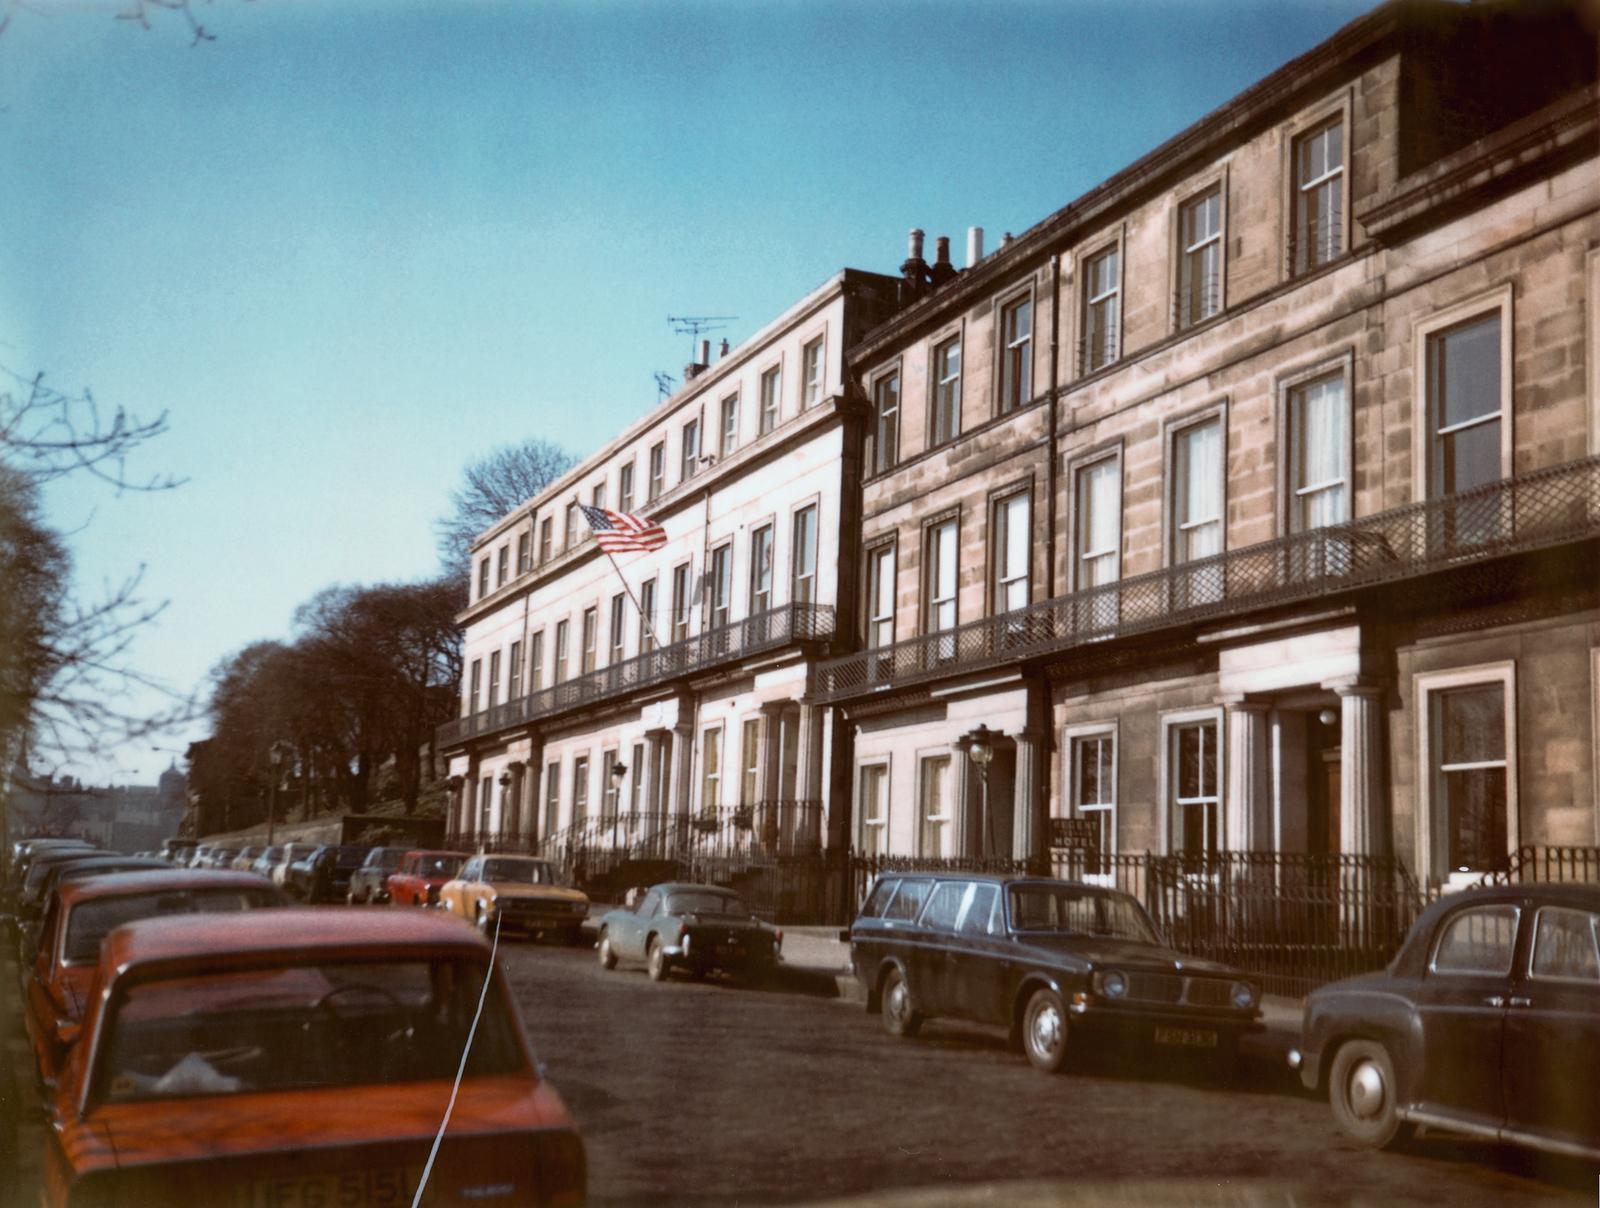 Edinburgh - Consulate Office Building